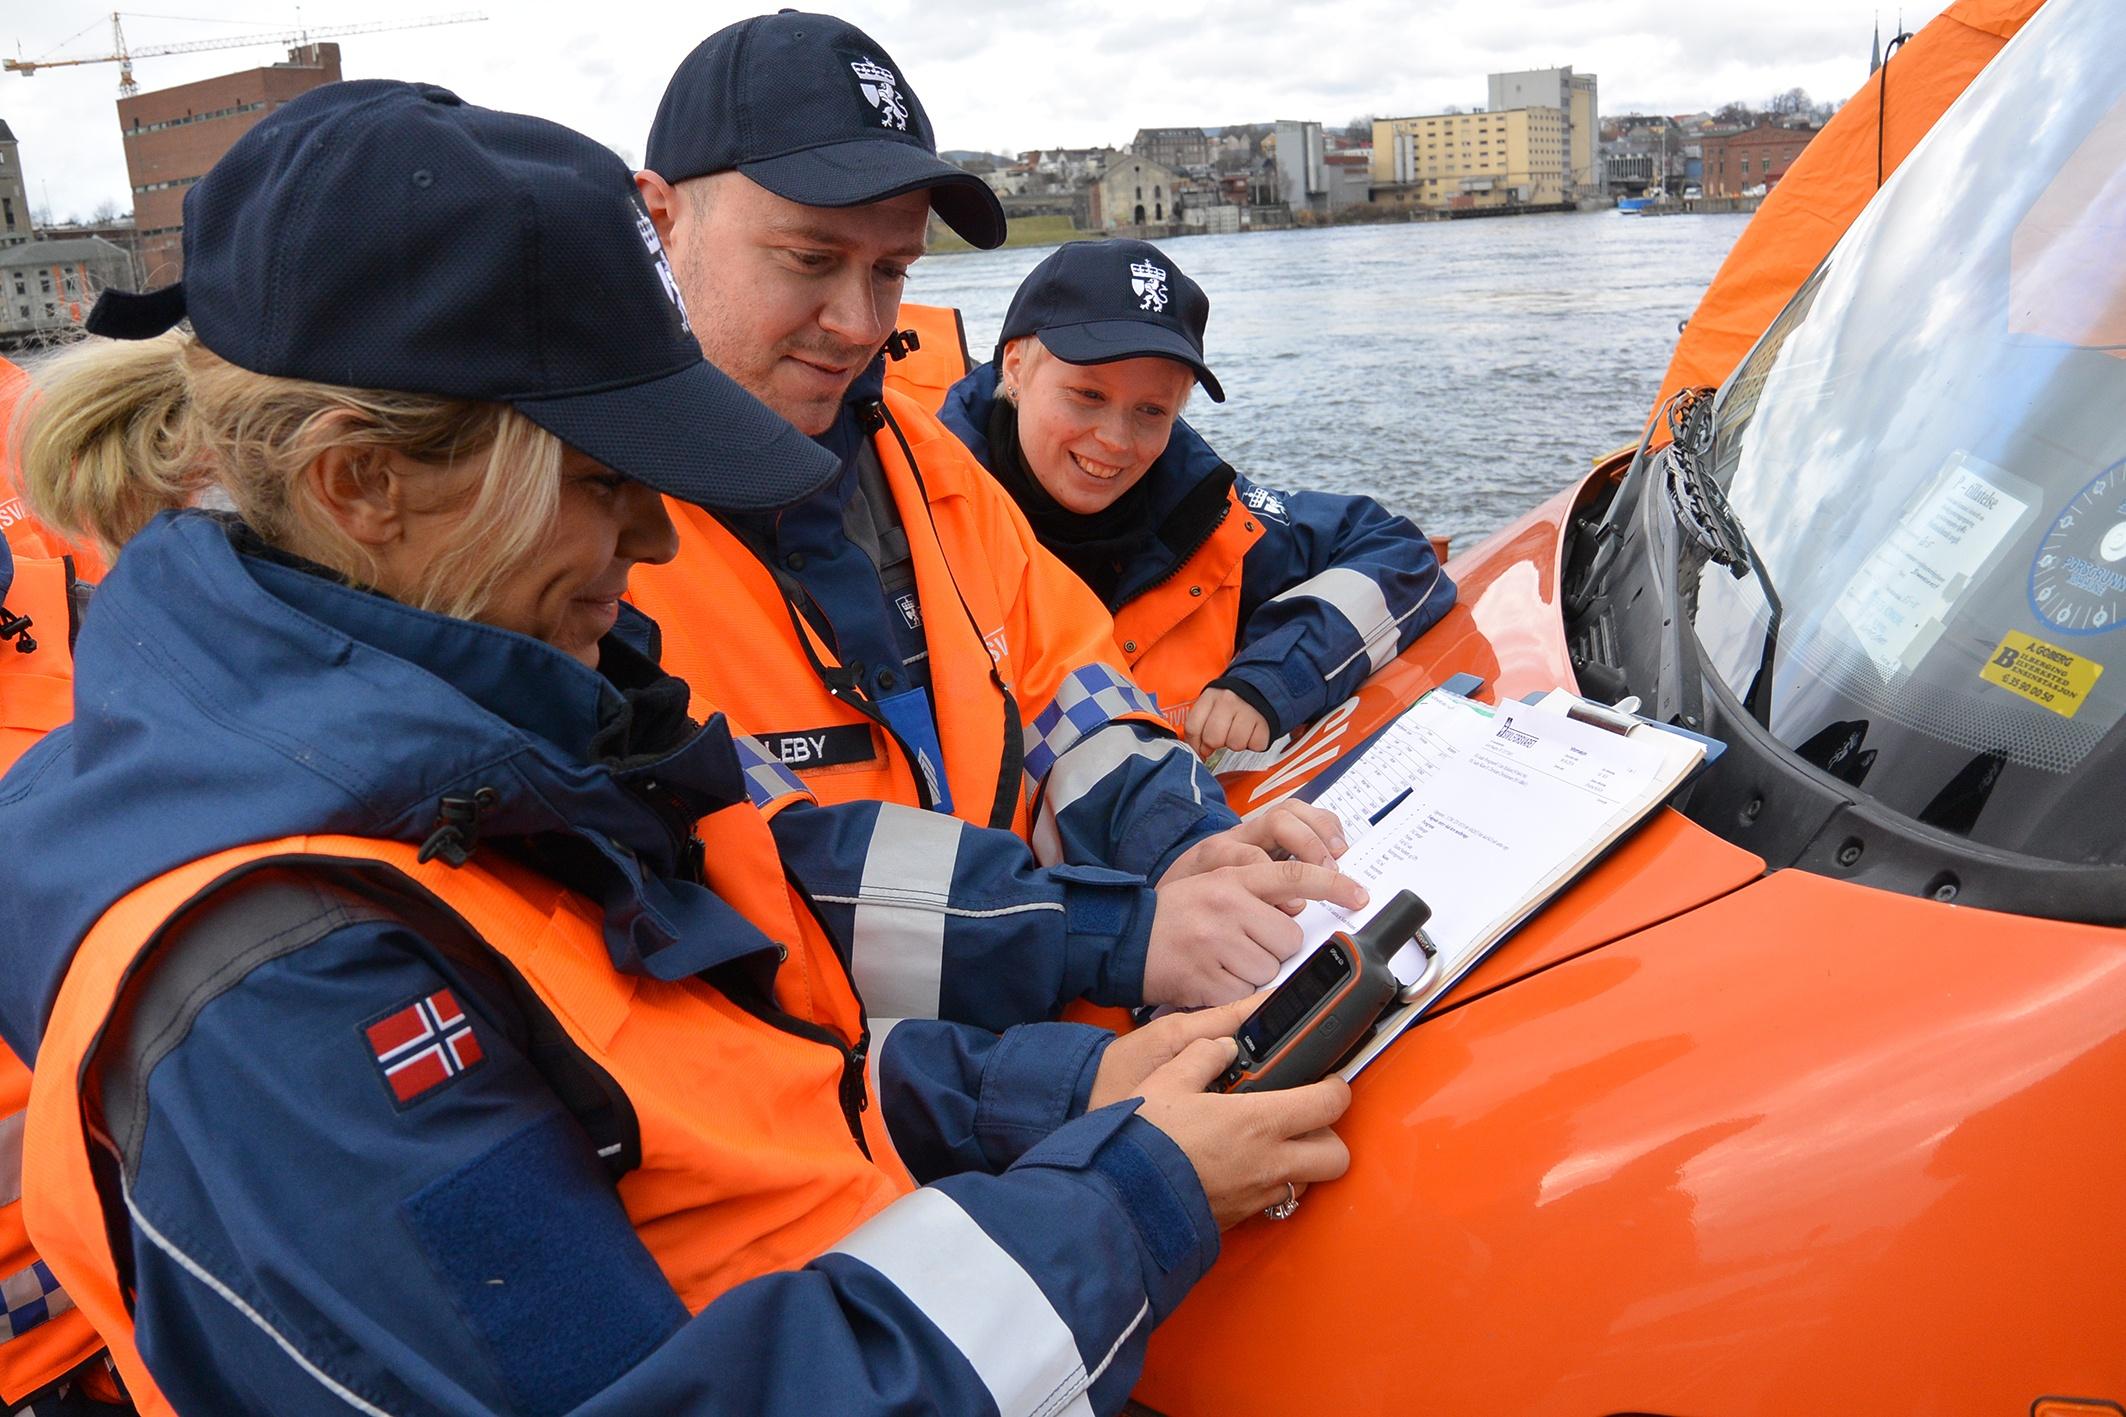 Sivilforsvaret uses Novacura Flow, Photo:DSB